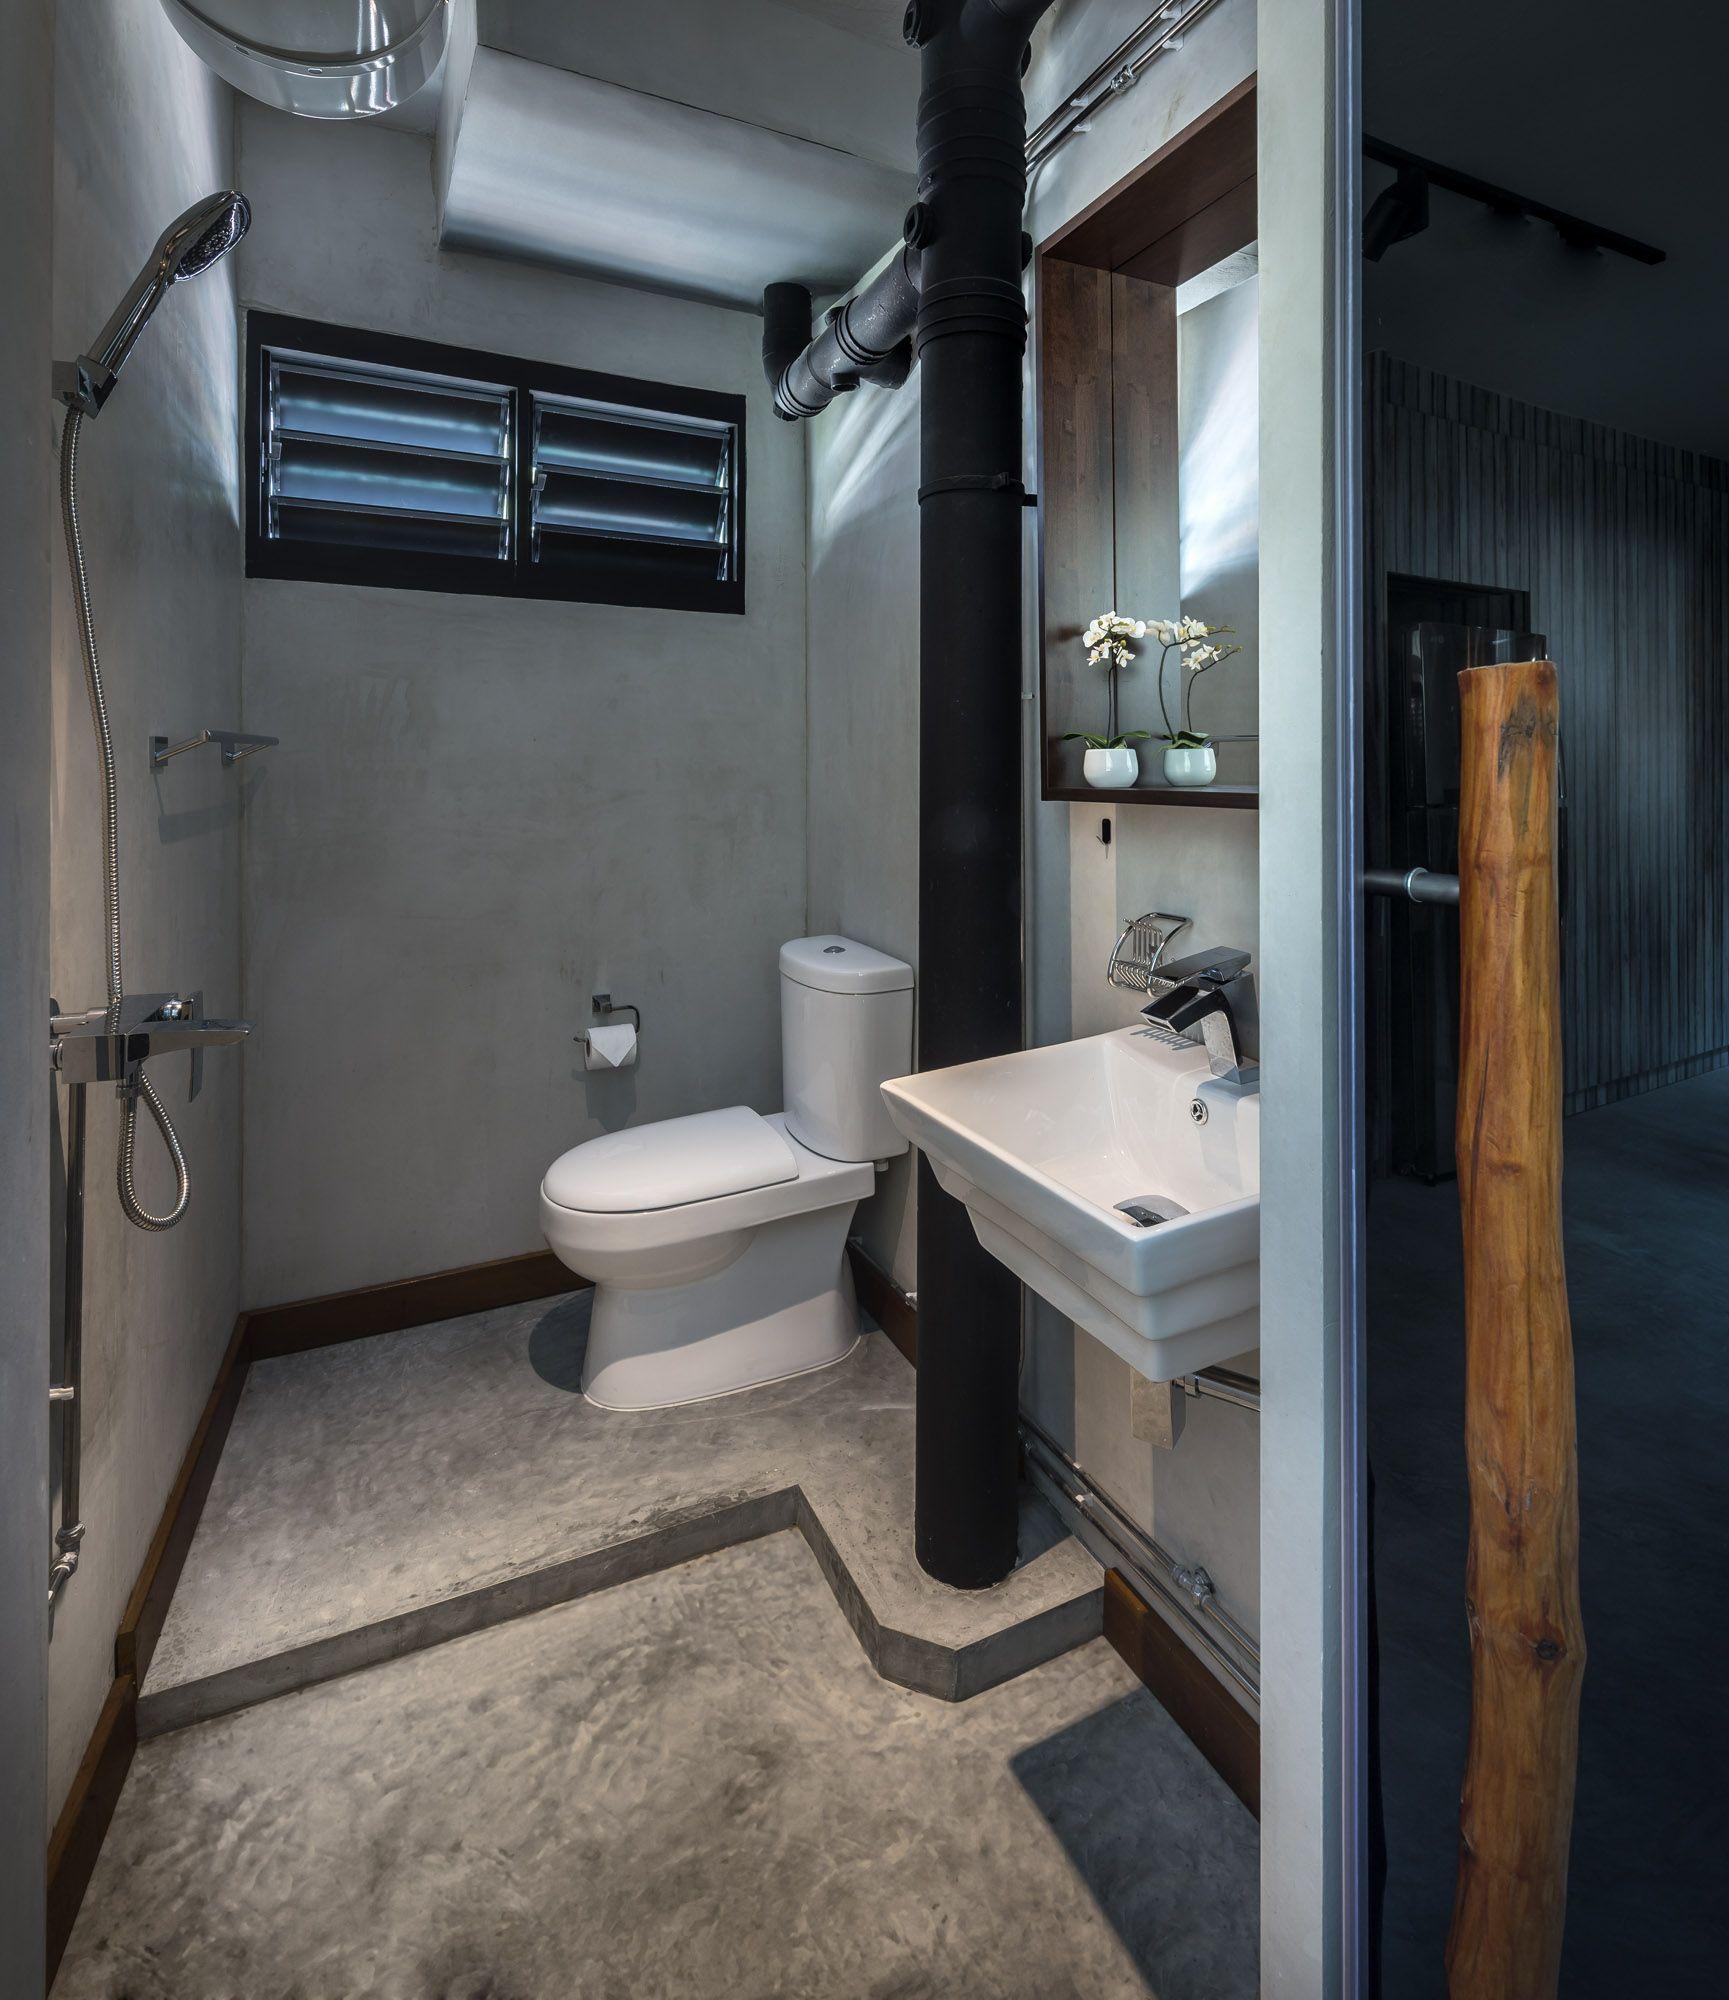 3 Room Hdb Maybe Chg Door Direction Fir Toilet Bathroom Design Toilet Design Minimalist Toilets